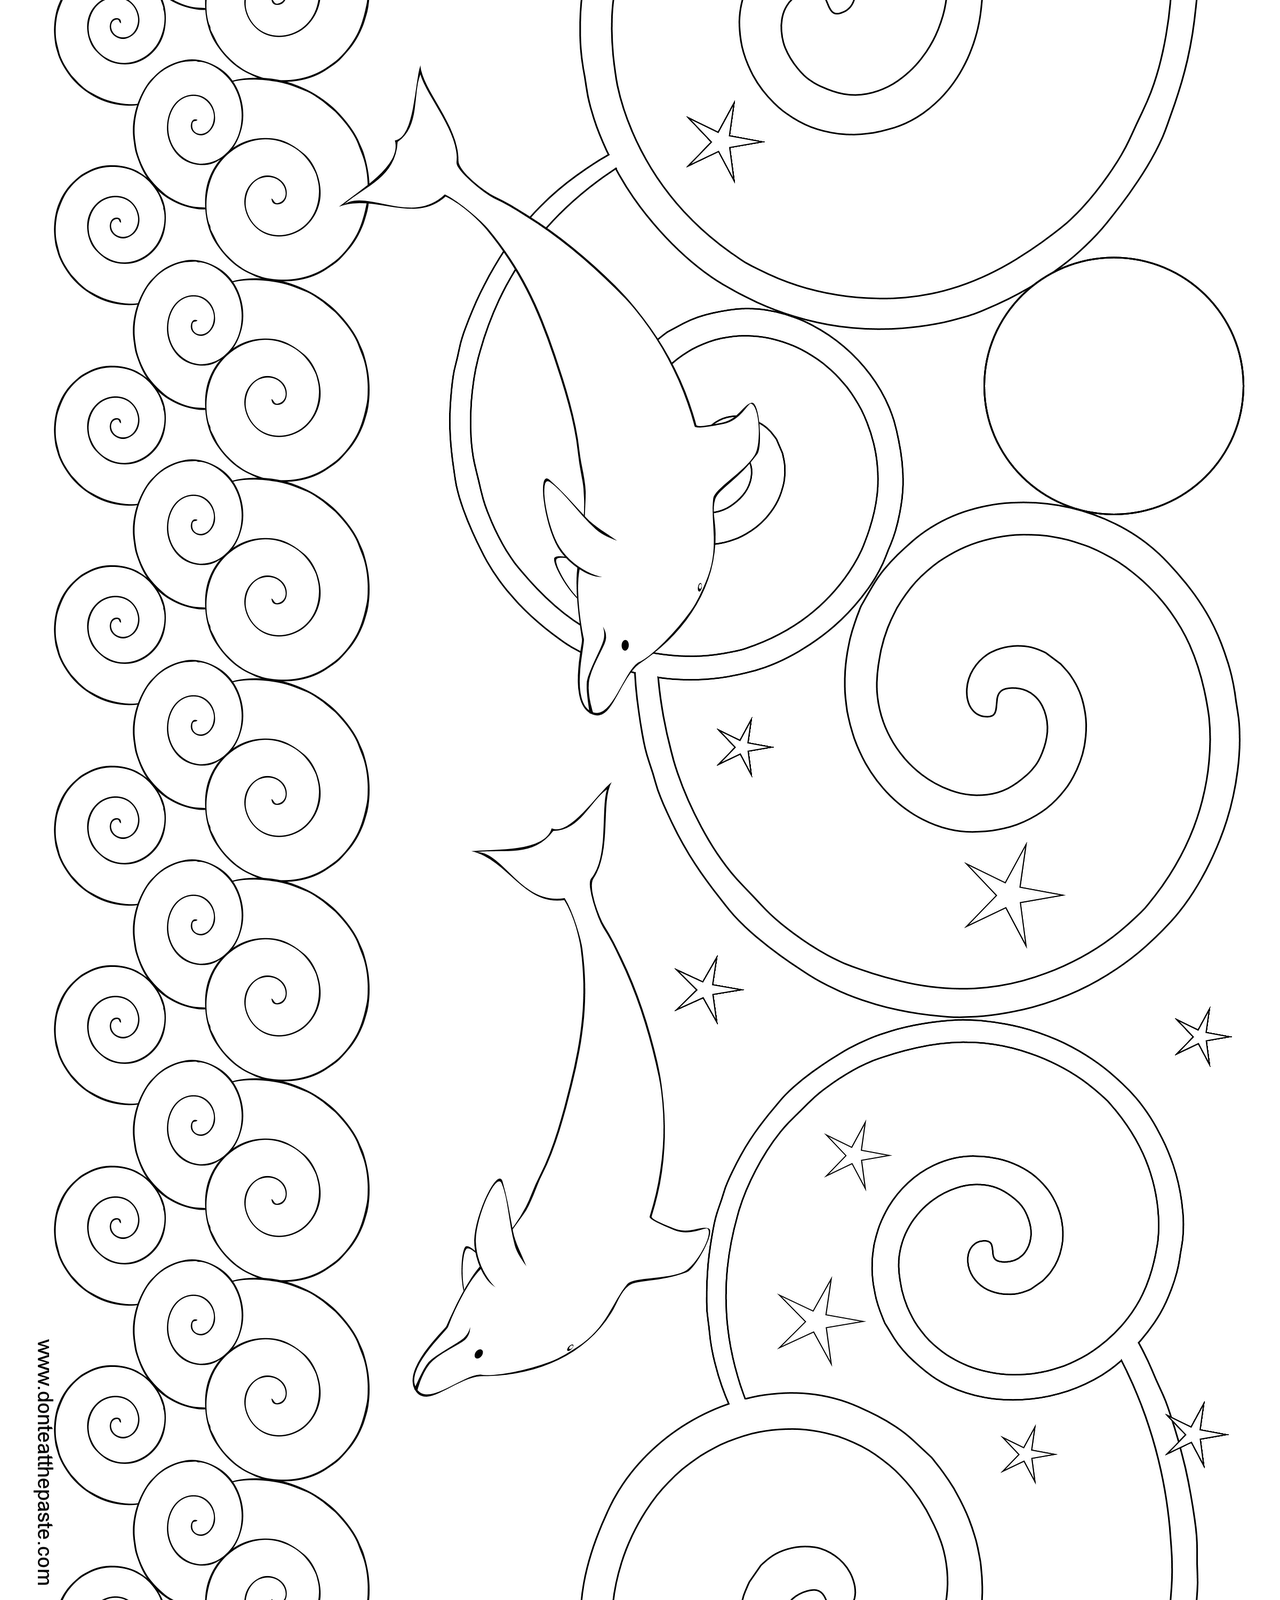 CROCHET DOLPHIN PATTERNS